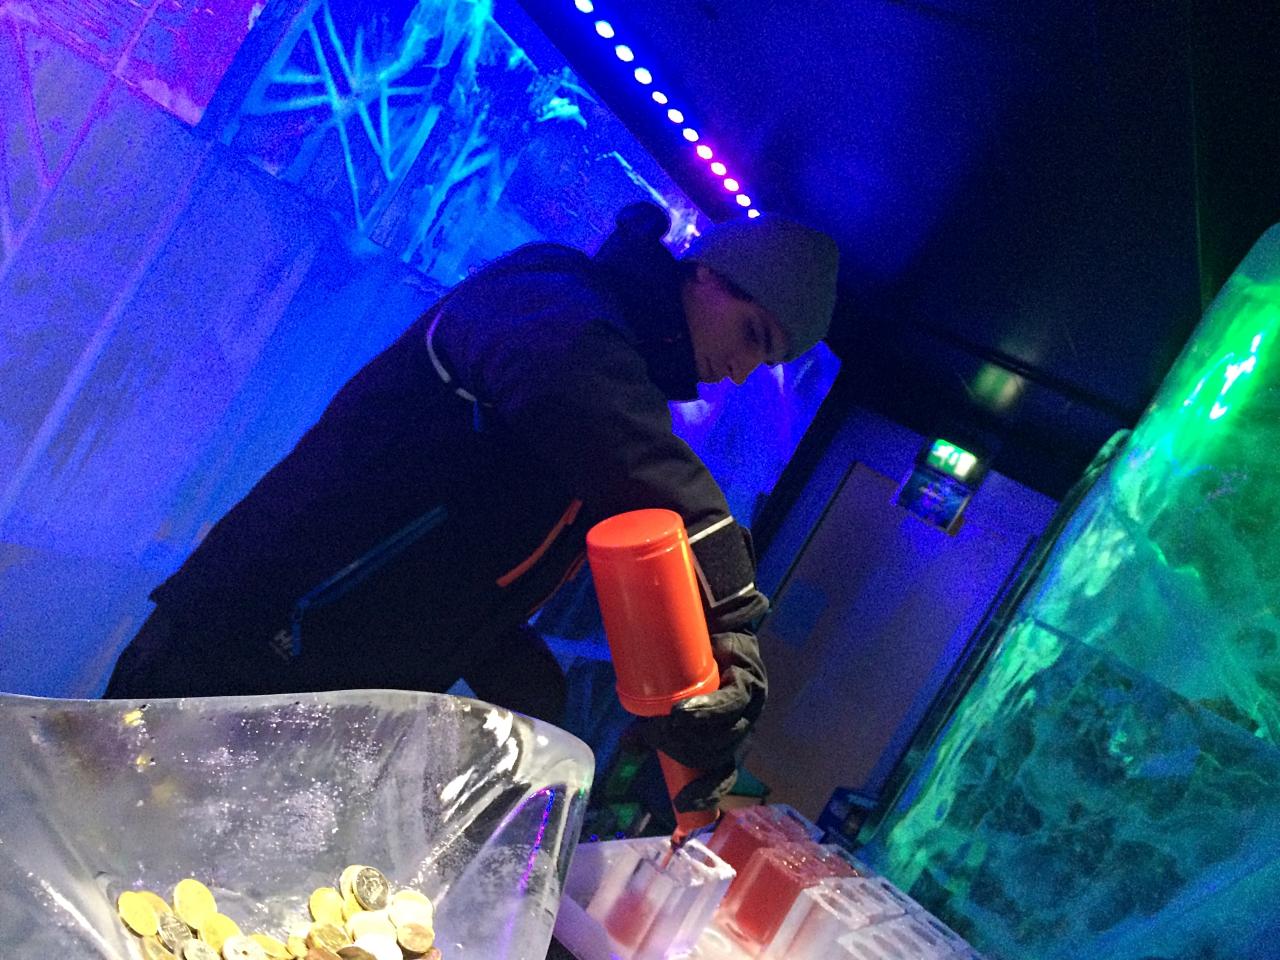 Absolut Ice Bar Mixologist